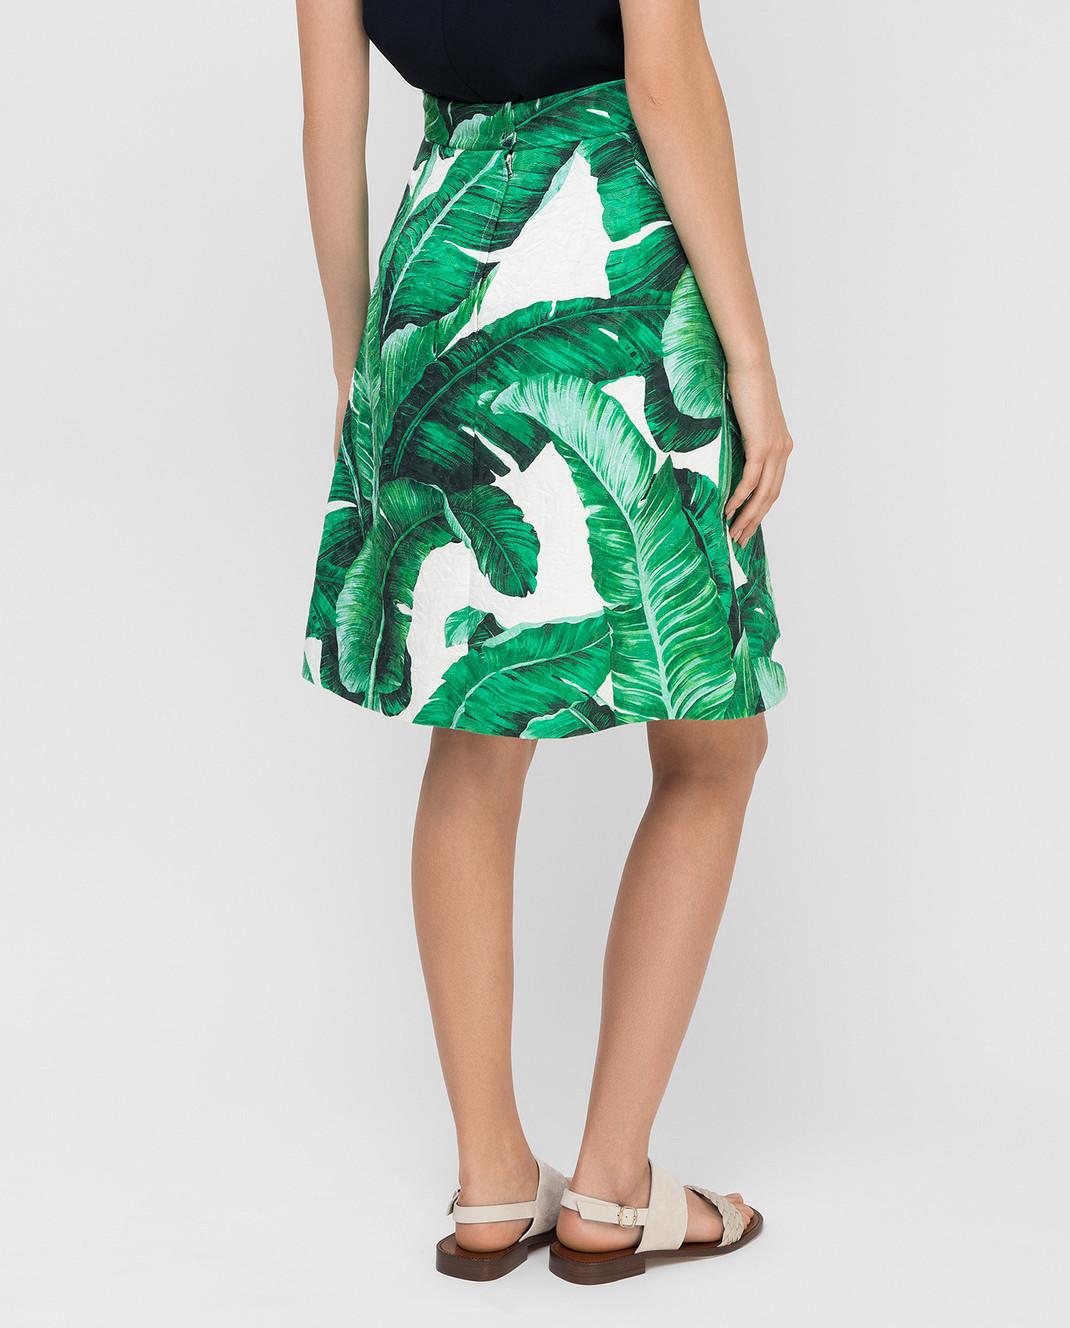 Dolce&Gabbana Зеленая юбка F4AKYTFSMY7 изображение 4